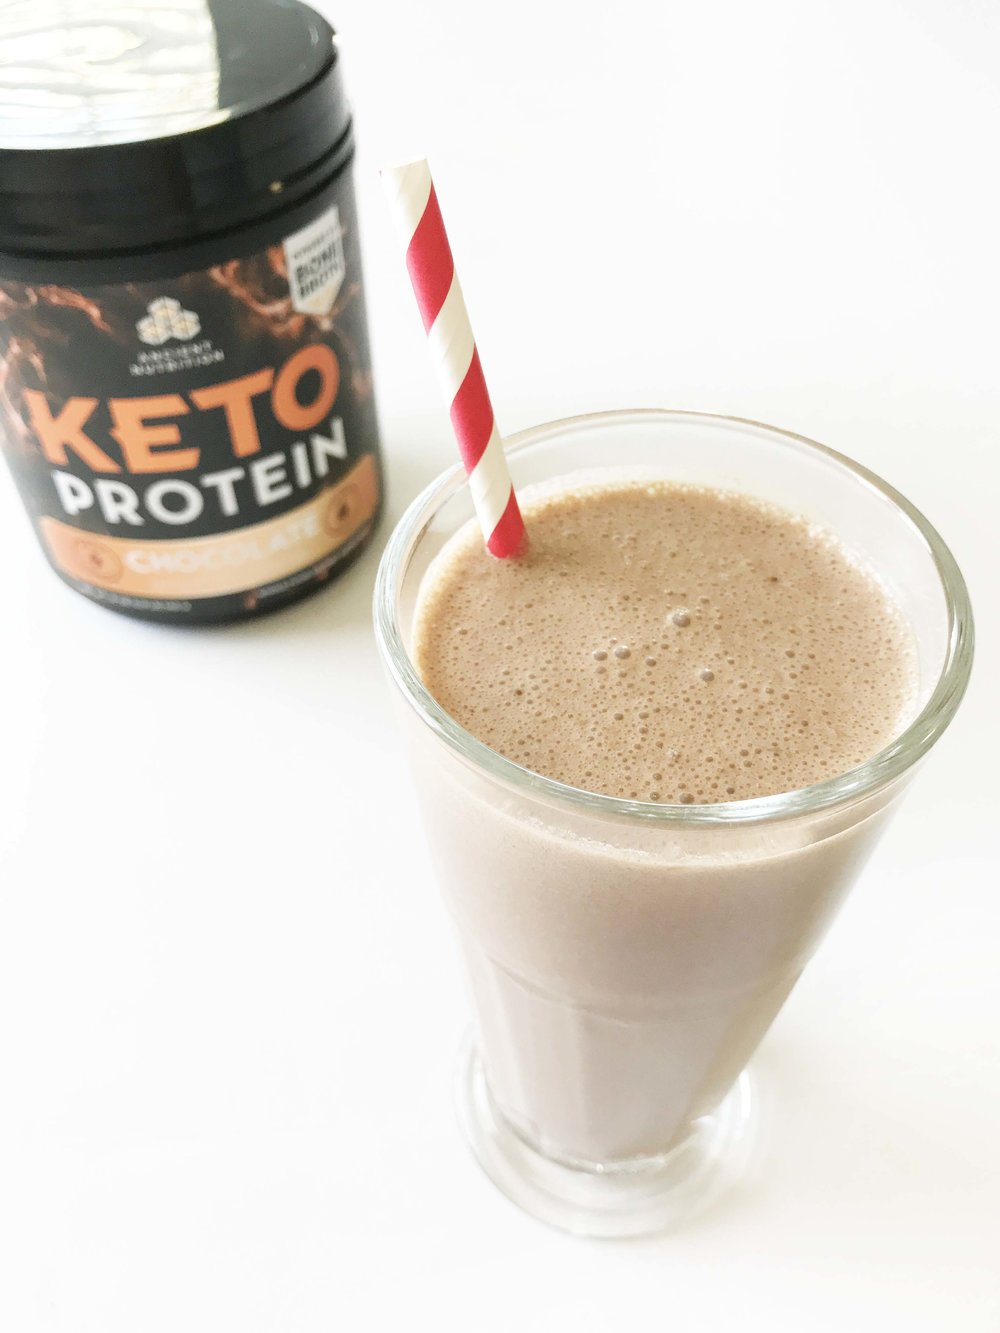 keto-chocolate-pb-shake4.jpg